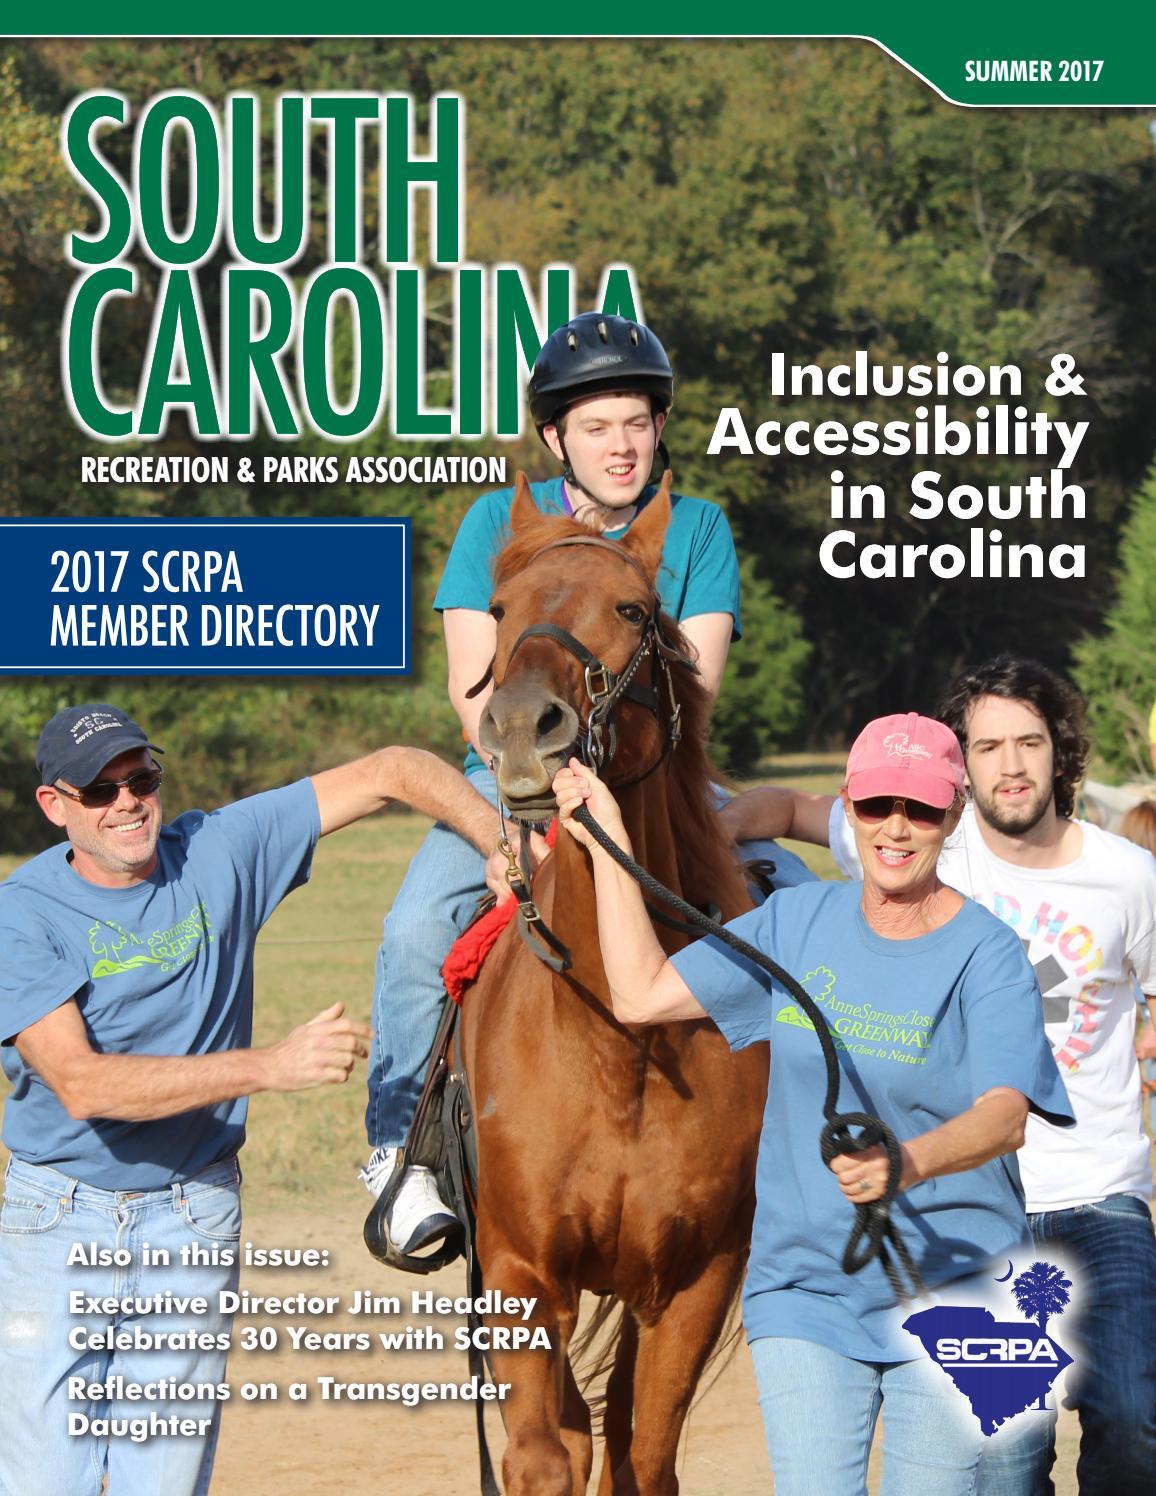 South Carolina Recreation & Park Magazine